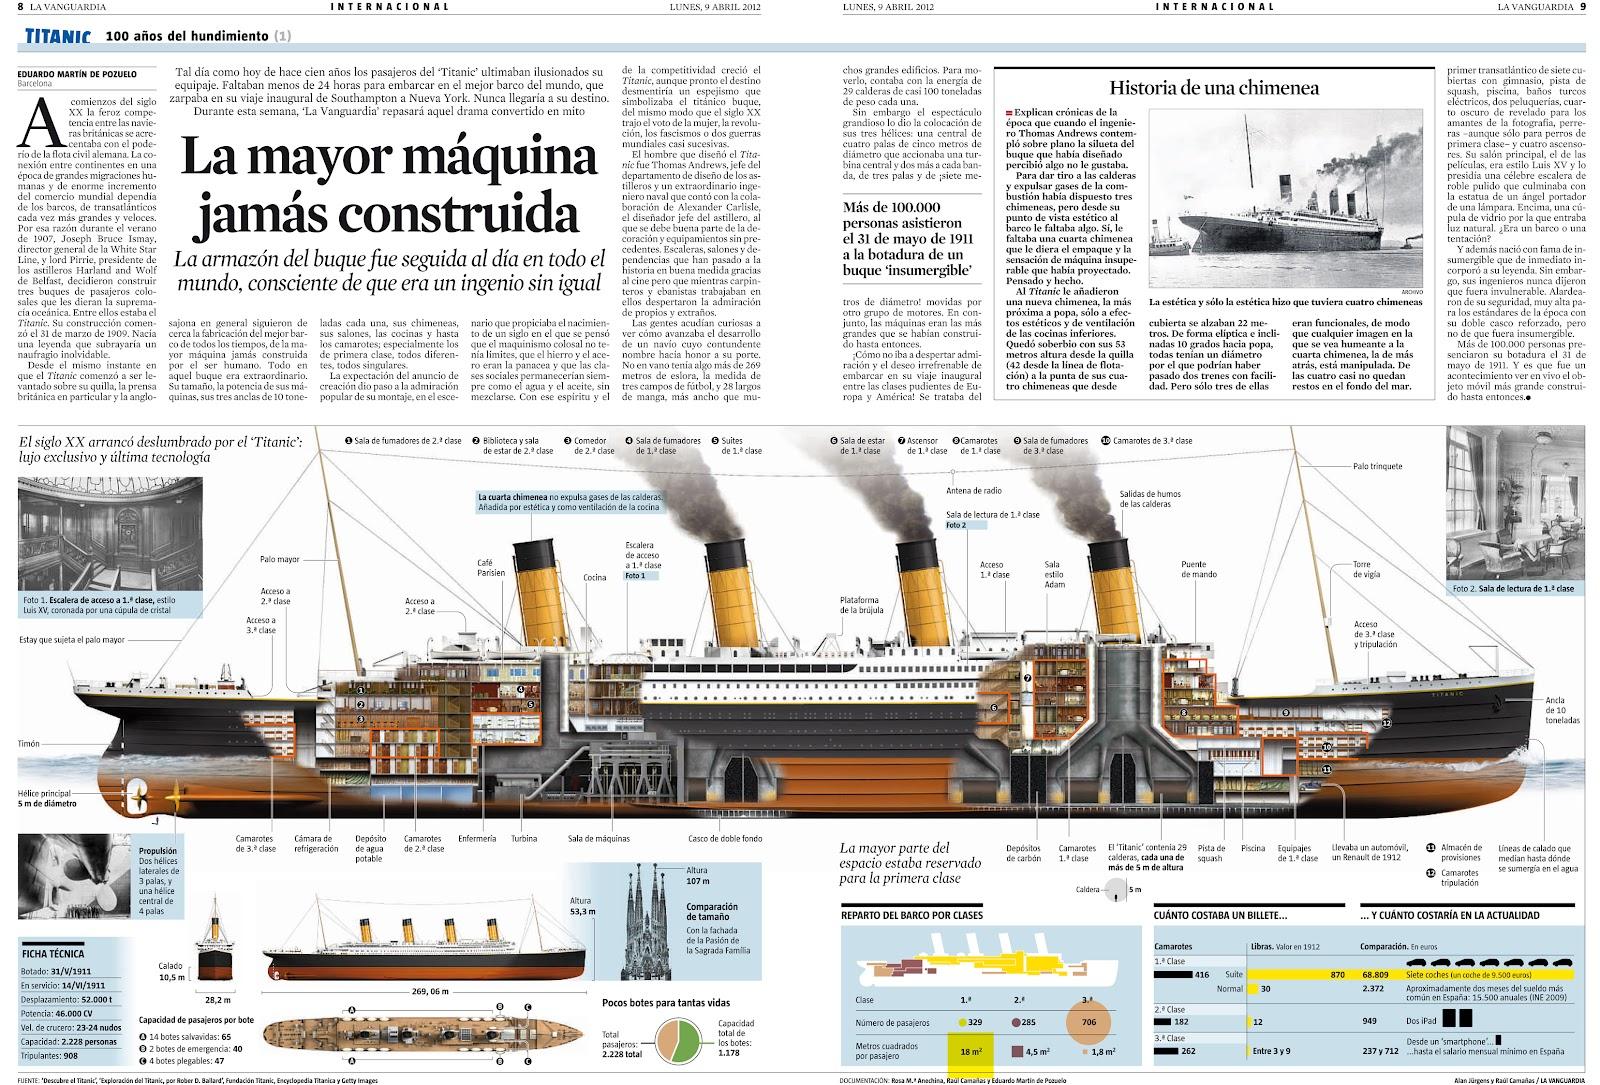 inside the titanic diagram 1995 honda civic wiring radio todo sobre el infografia infographic